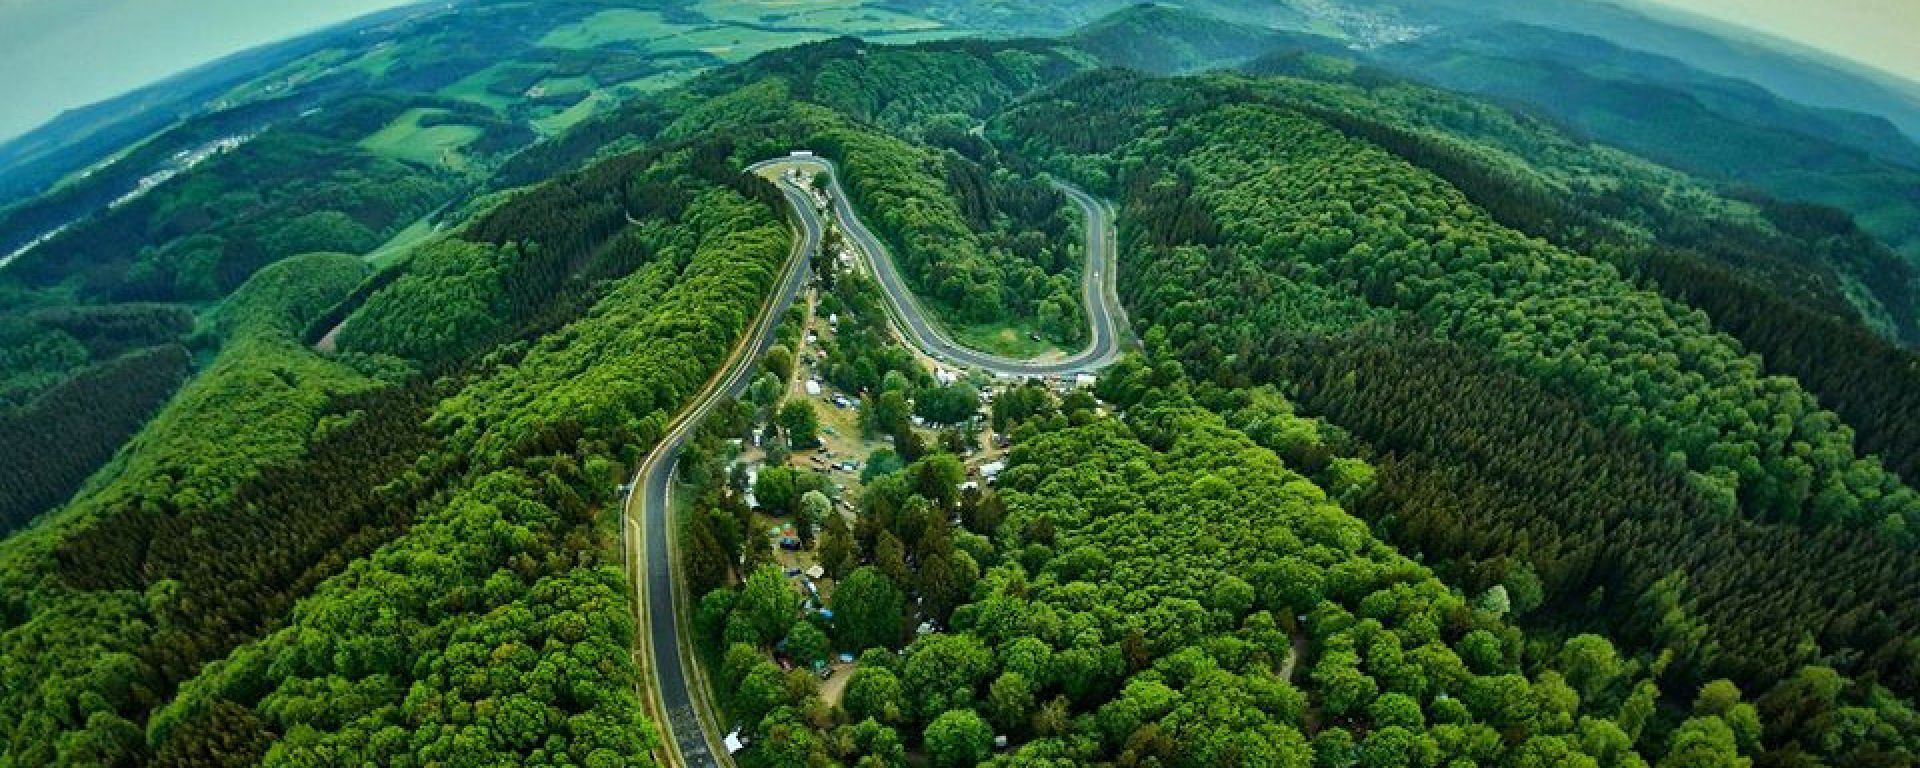 Nurburgring: l'Inferno Verde in una foto di Robert Kah